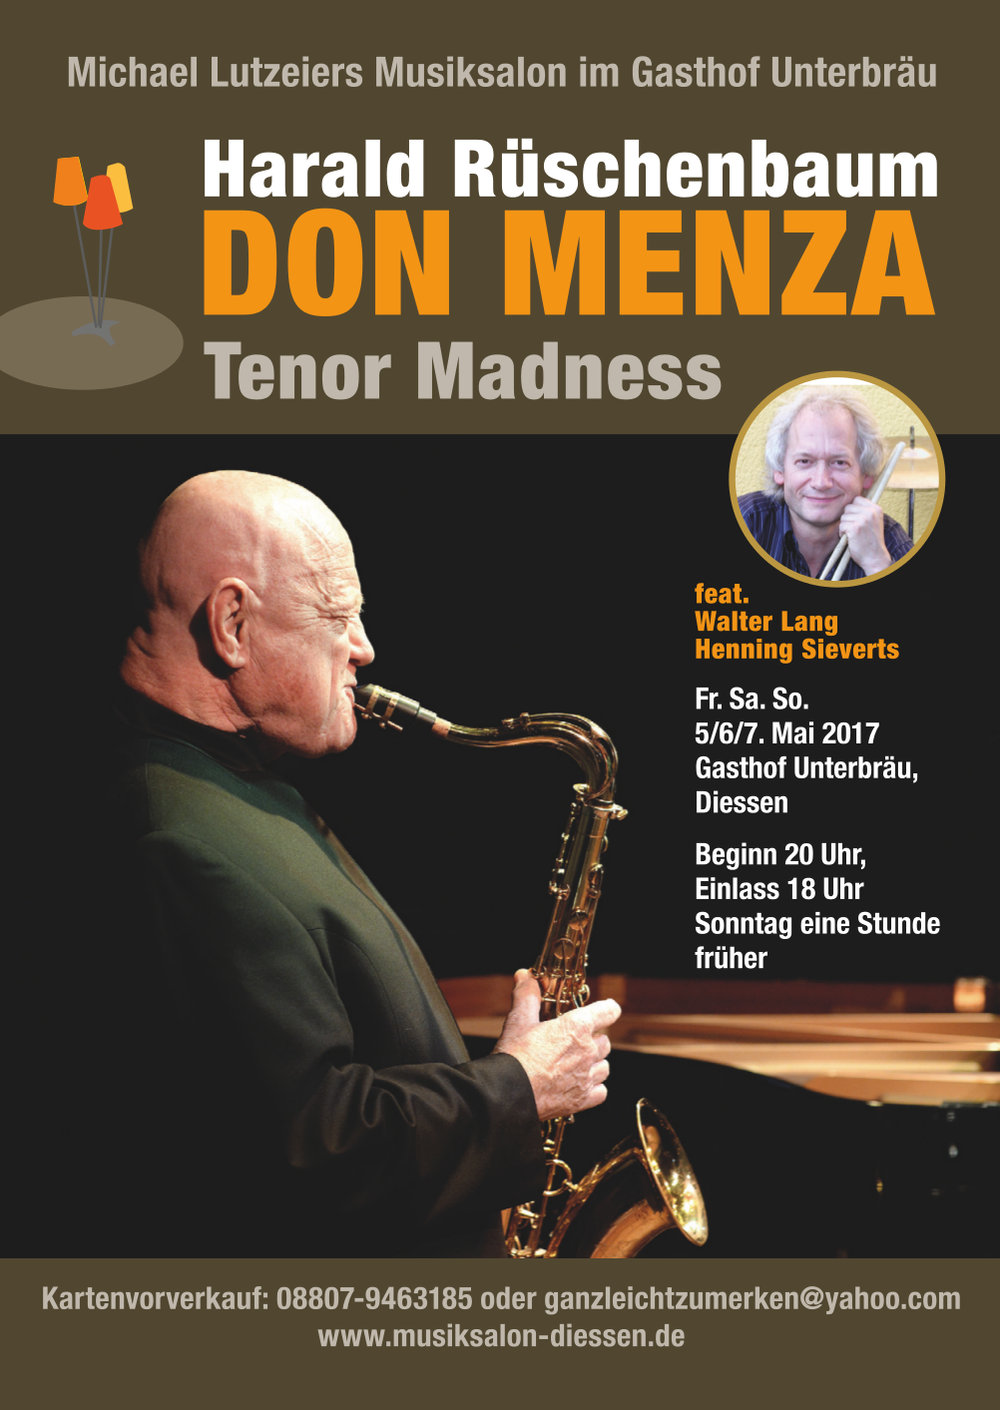 DON MENZA Tenor Madness im Musiksalon Diessen, 5/6/7. Mai 2017